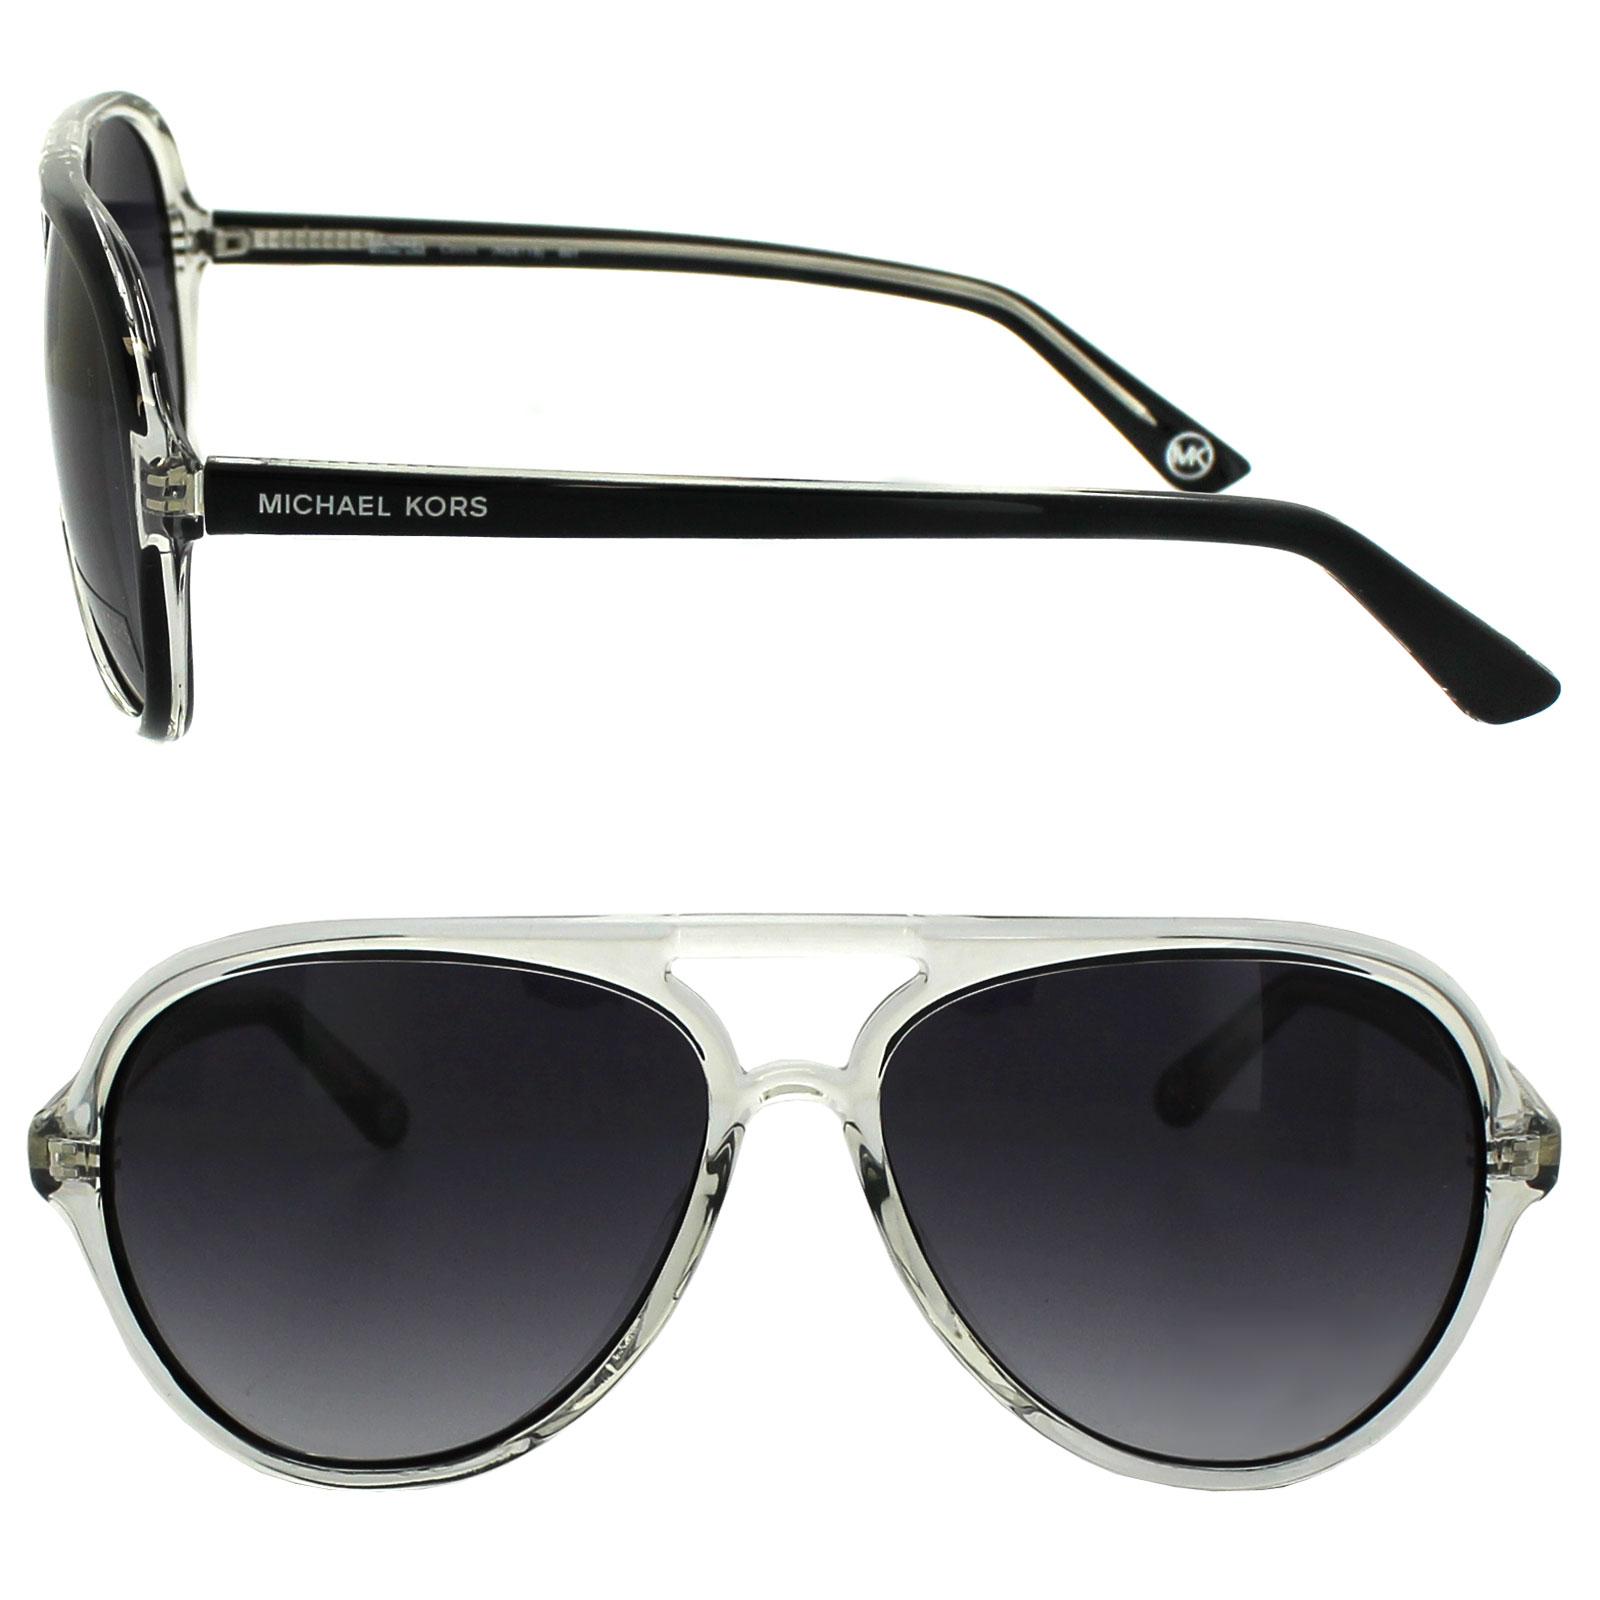 4cfbac9014 Michael Kors Caicos M2811S Sunglasses Thumbnail 1 Michael Kors Caicos  M2811S Sunglasses Thumbnail 2 ...